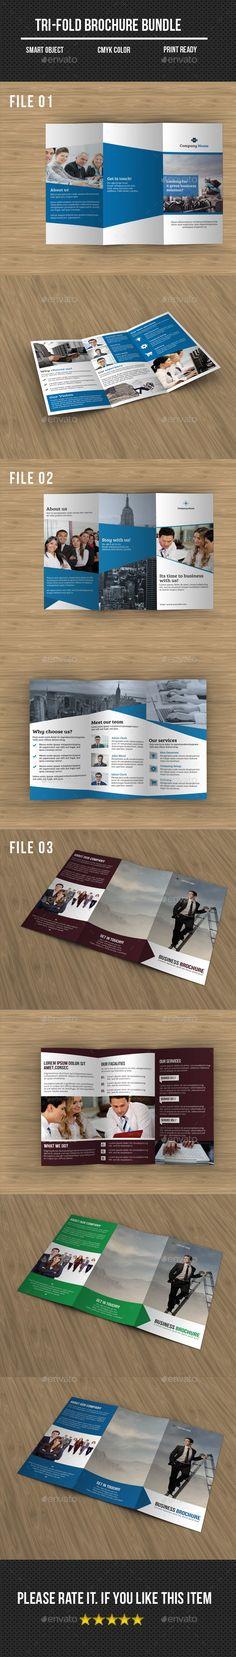 Corporate Tri- Fold Brochure Bundle Template #design Download: http://graphicriver.net/item/corporate-tri-fold-brochure-bundle/11694985?ref=ksioks